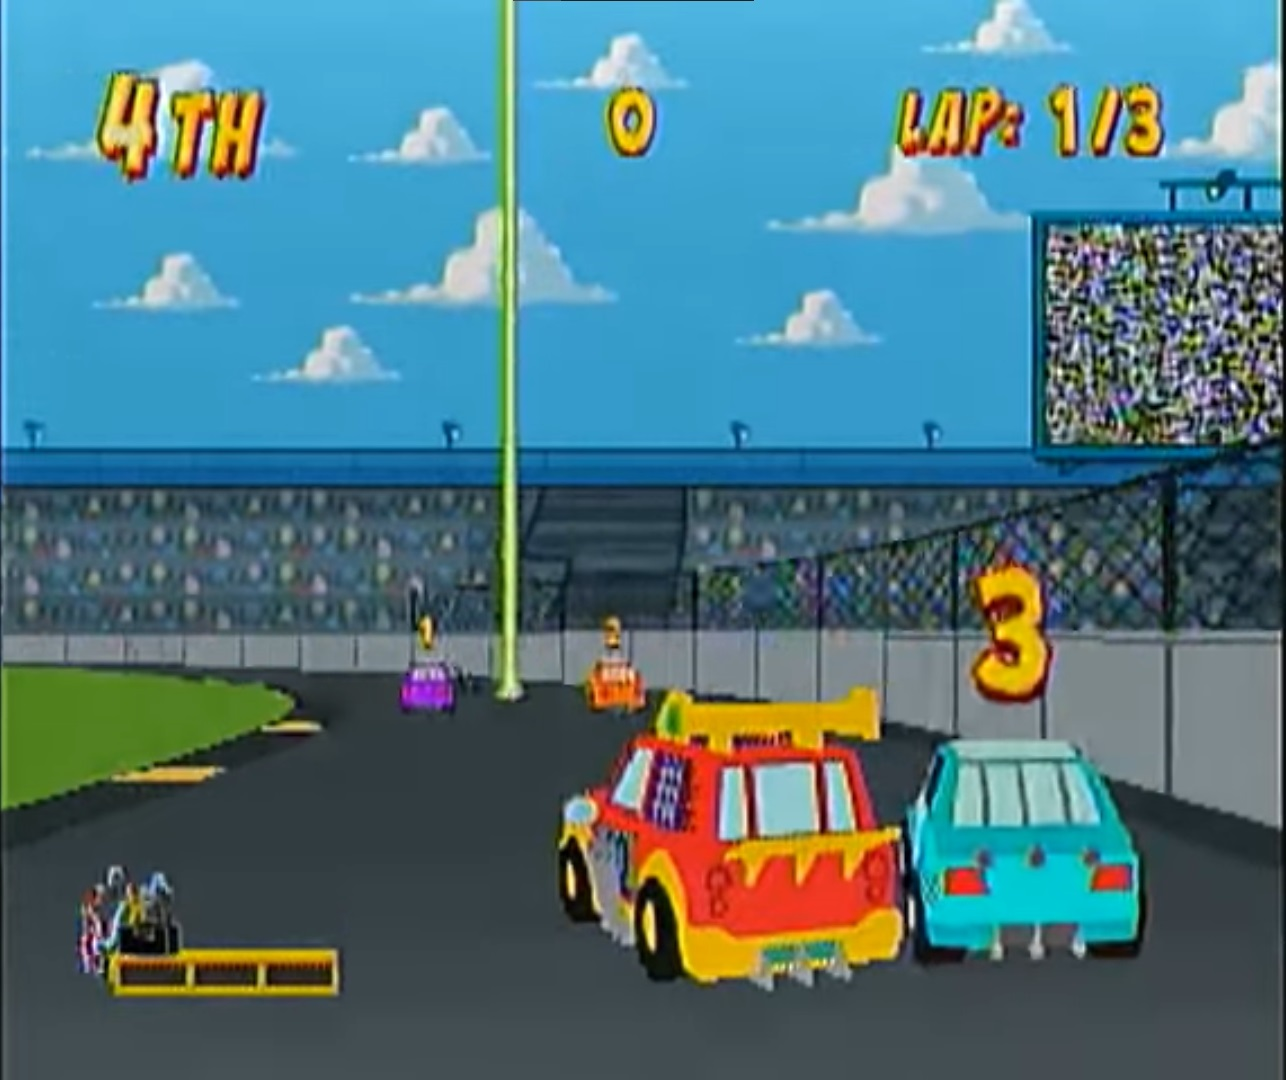 File:Best Game Ever! - firing Deflate-inator ray.jpg